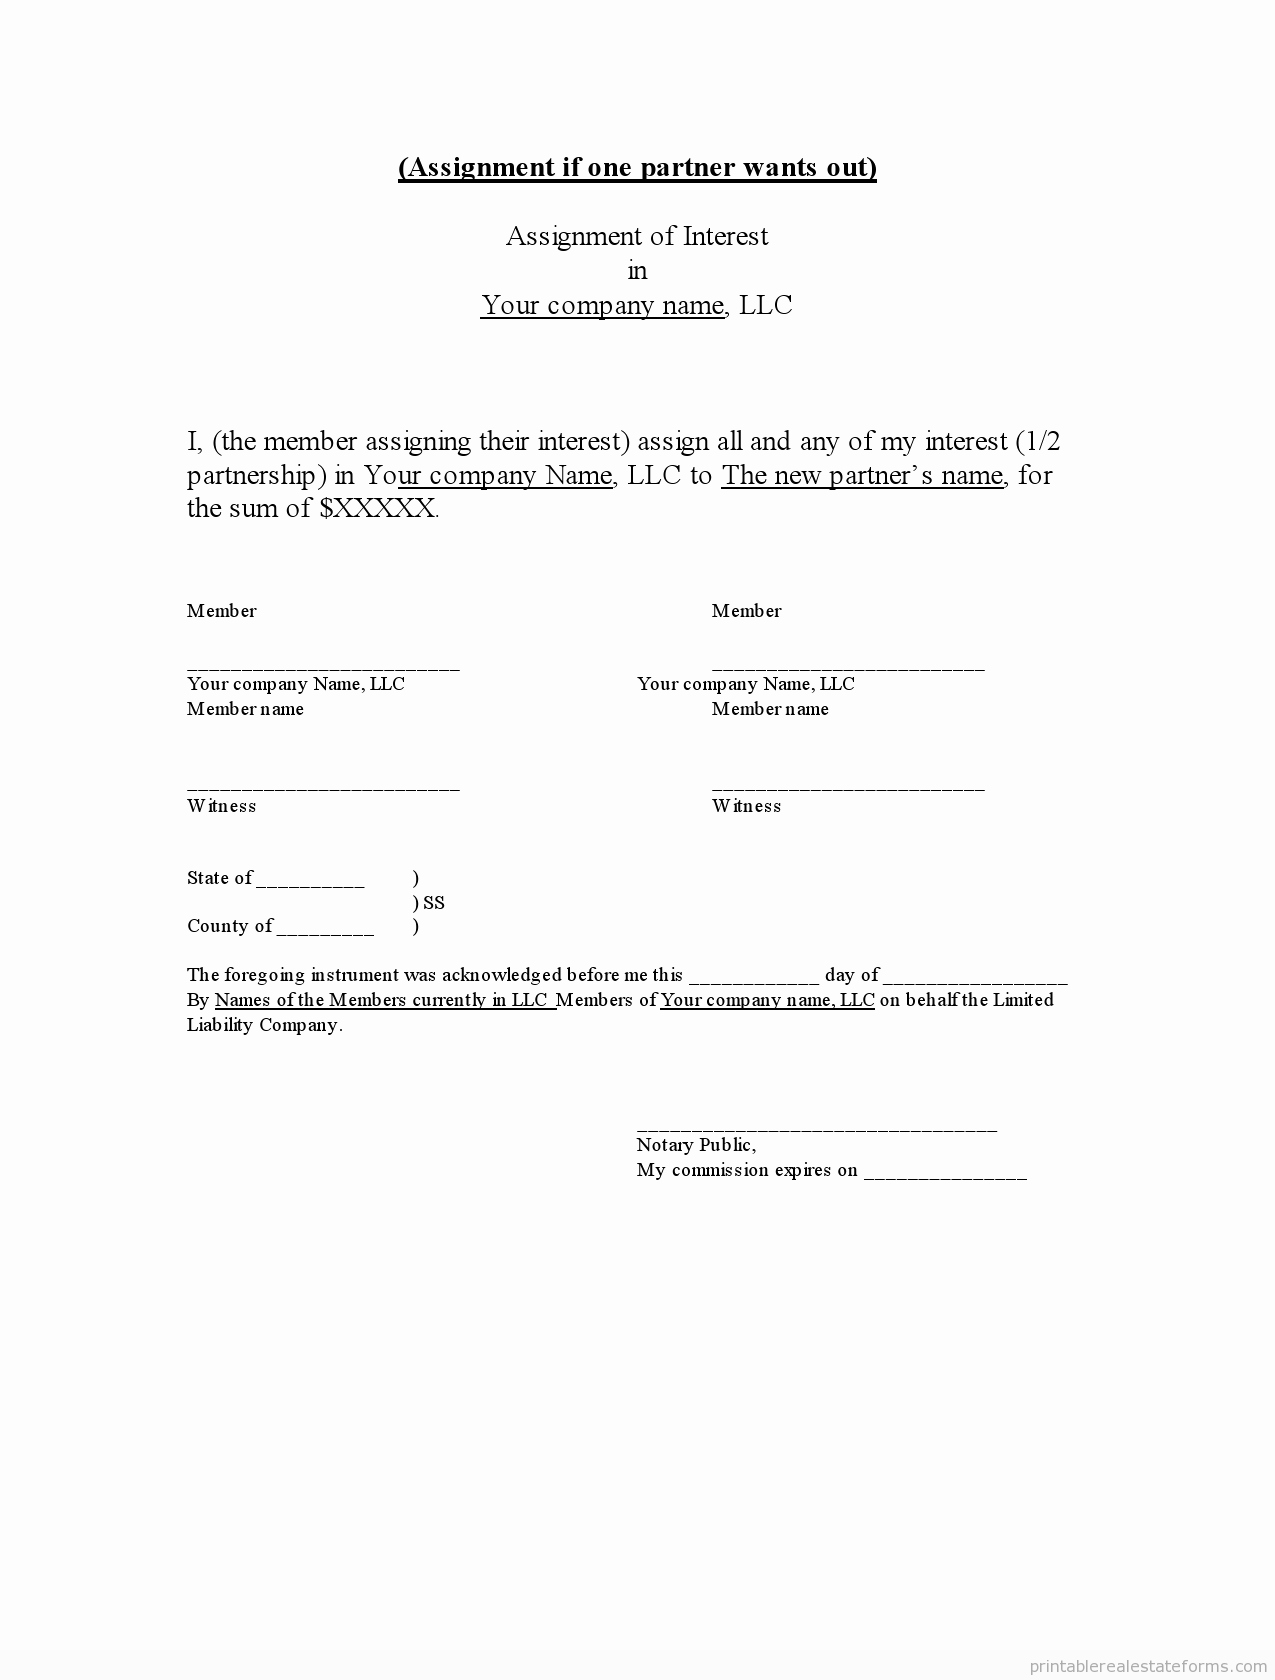 Llc Membership Certificate Template Elegant Sample Printable assignment Of Llc Interest form